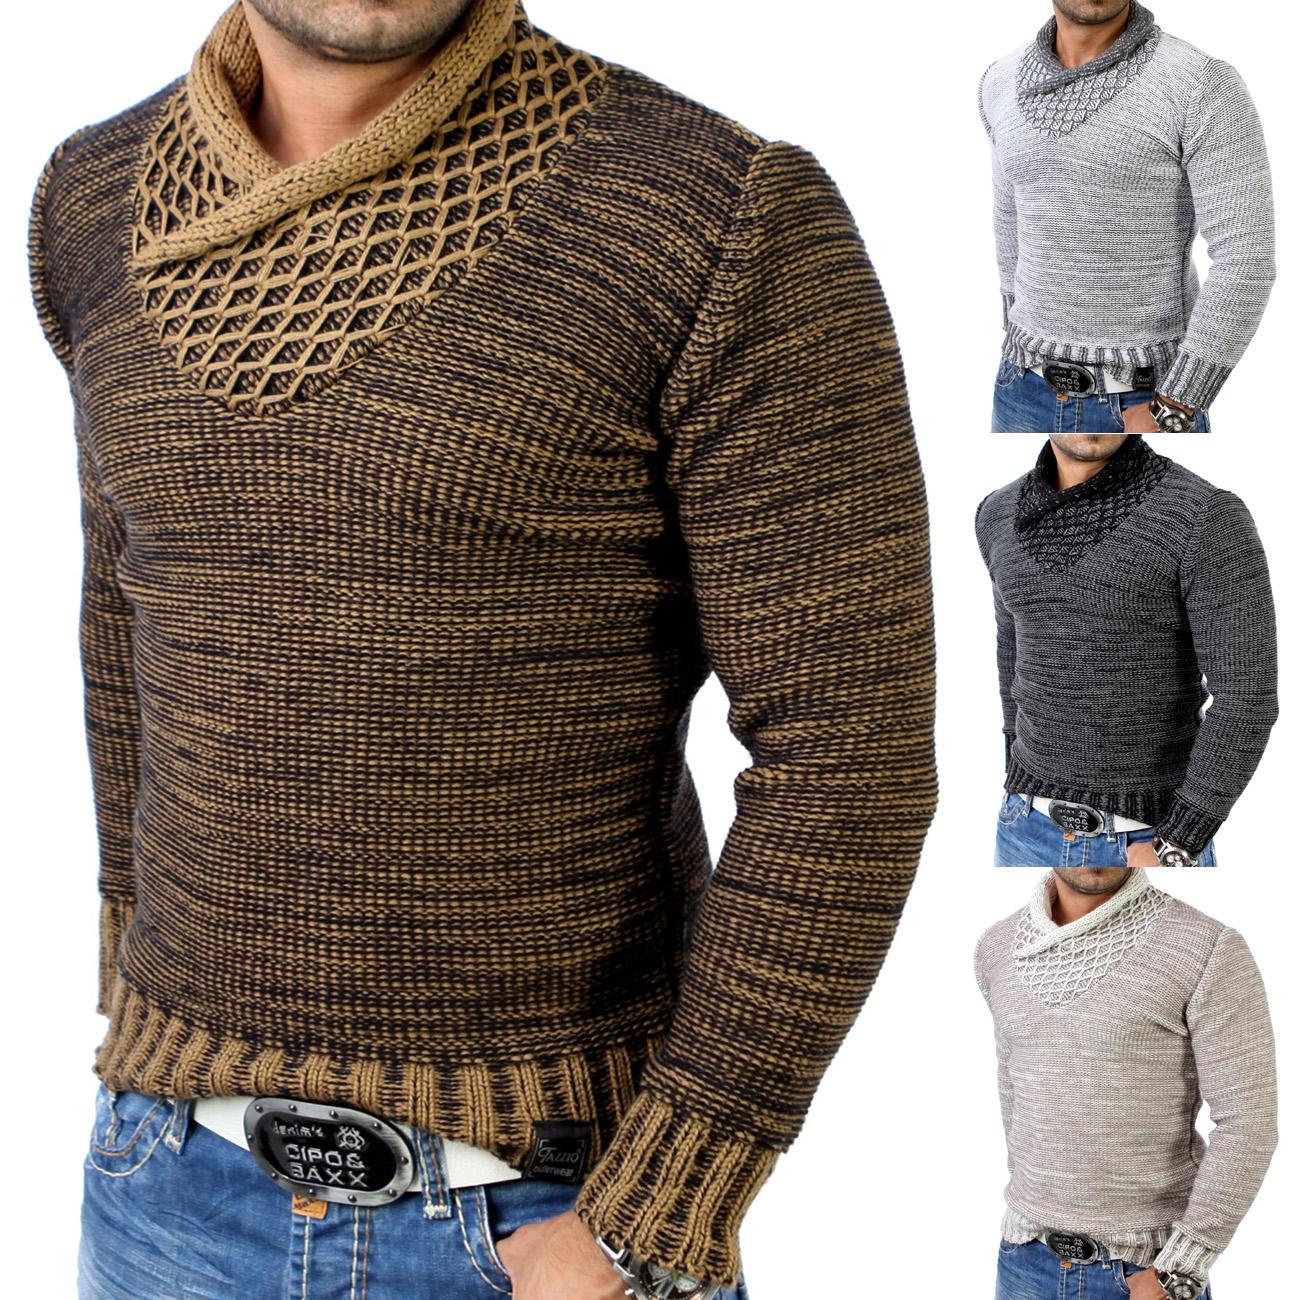 tazzio tz 3978 herren grobstrick winter pullover. Black Bedroom Furniture Sets. Home Design Ideas